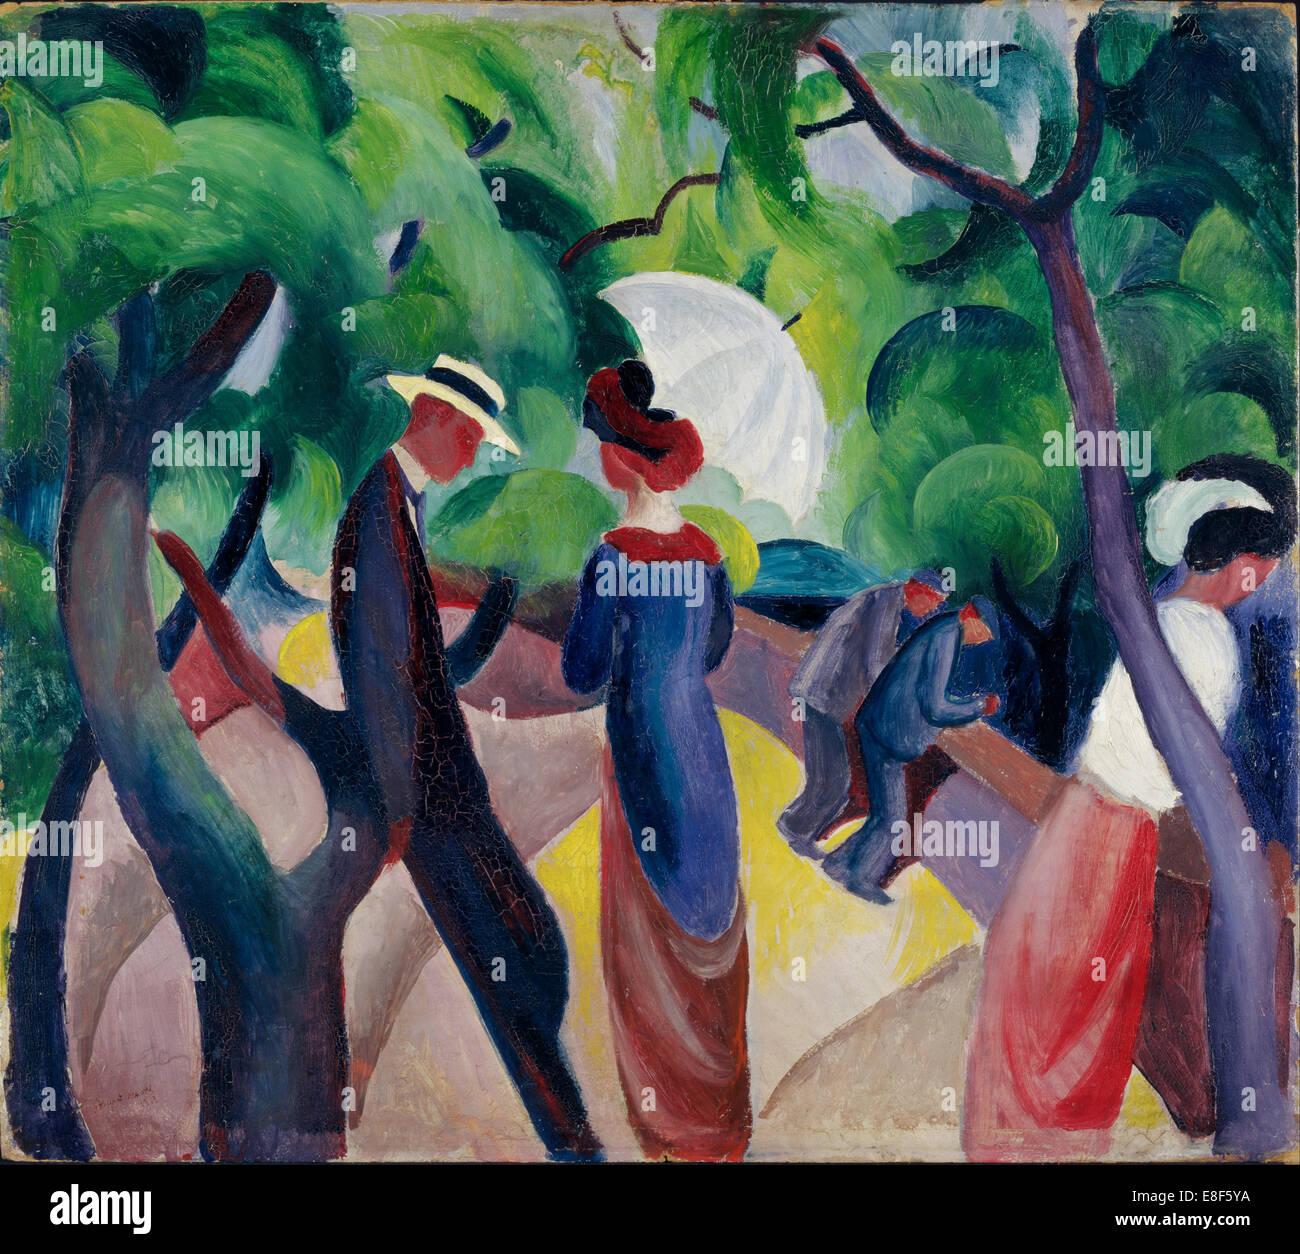 Promenade. Artist: Macke, August (1887-1914) - Stock Image